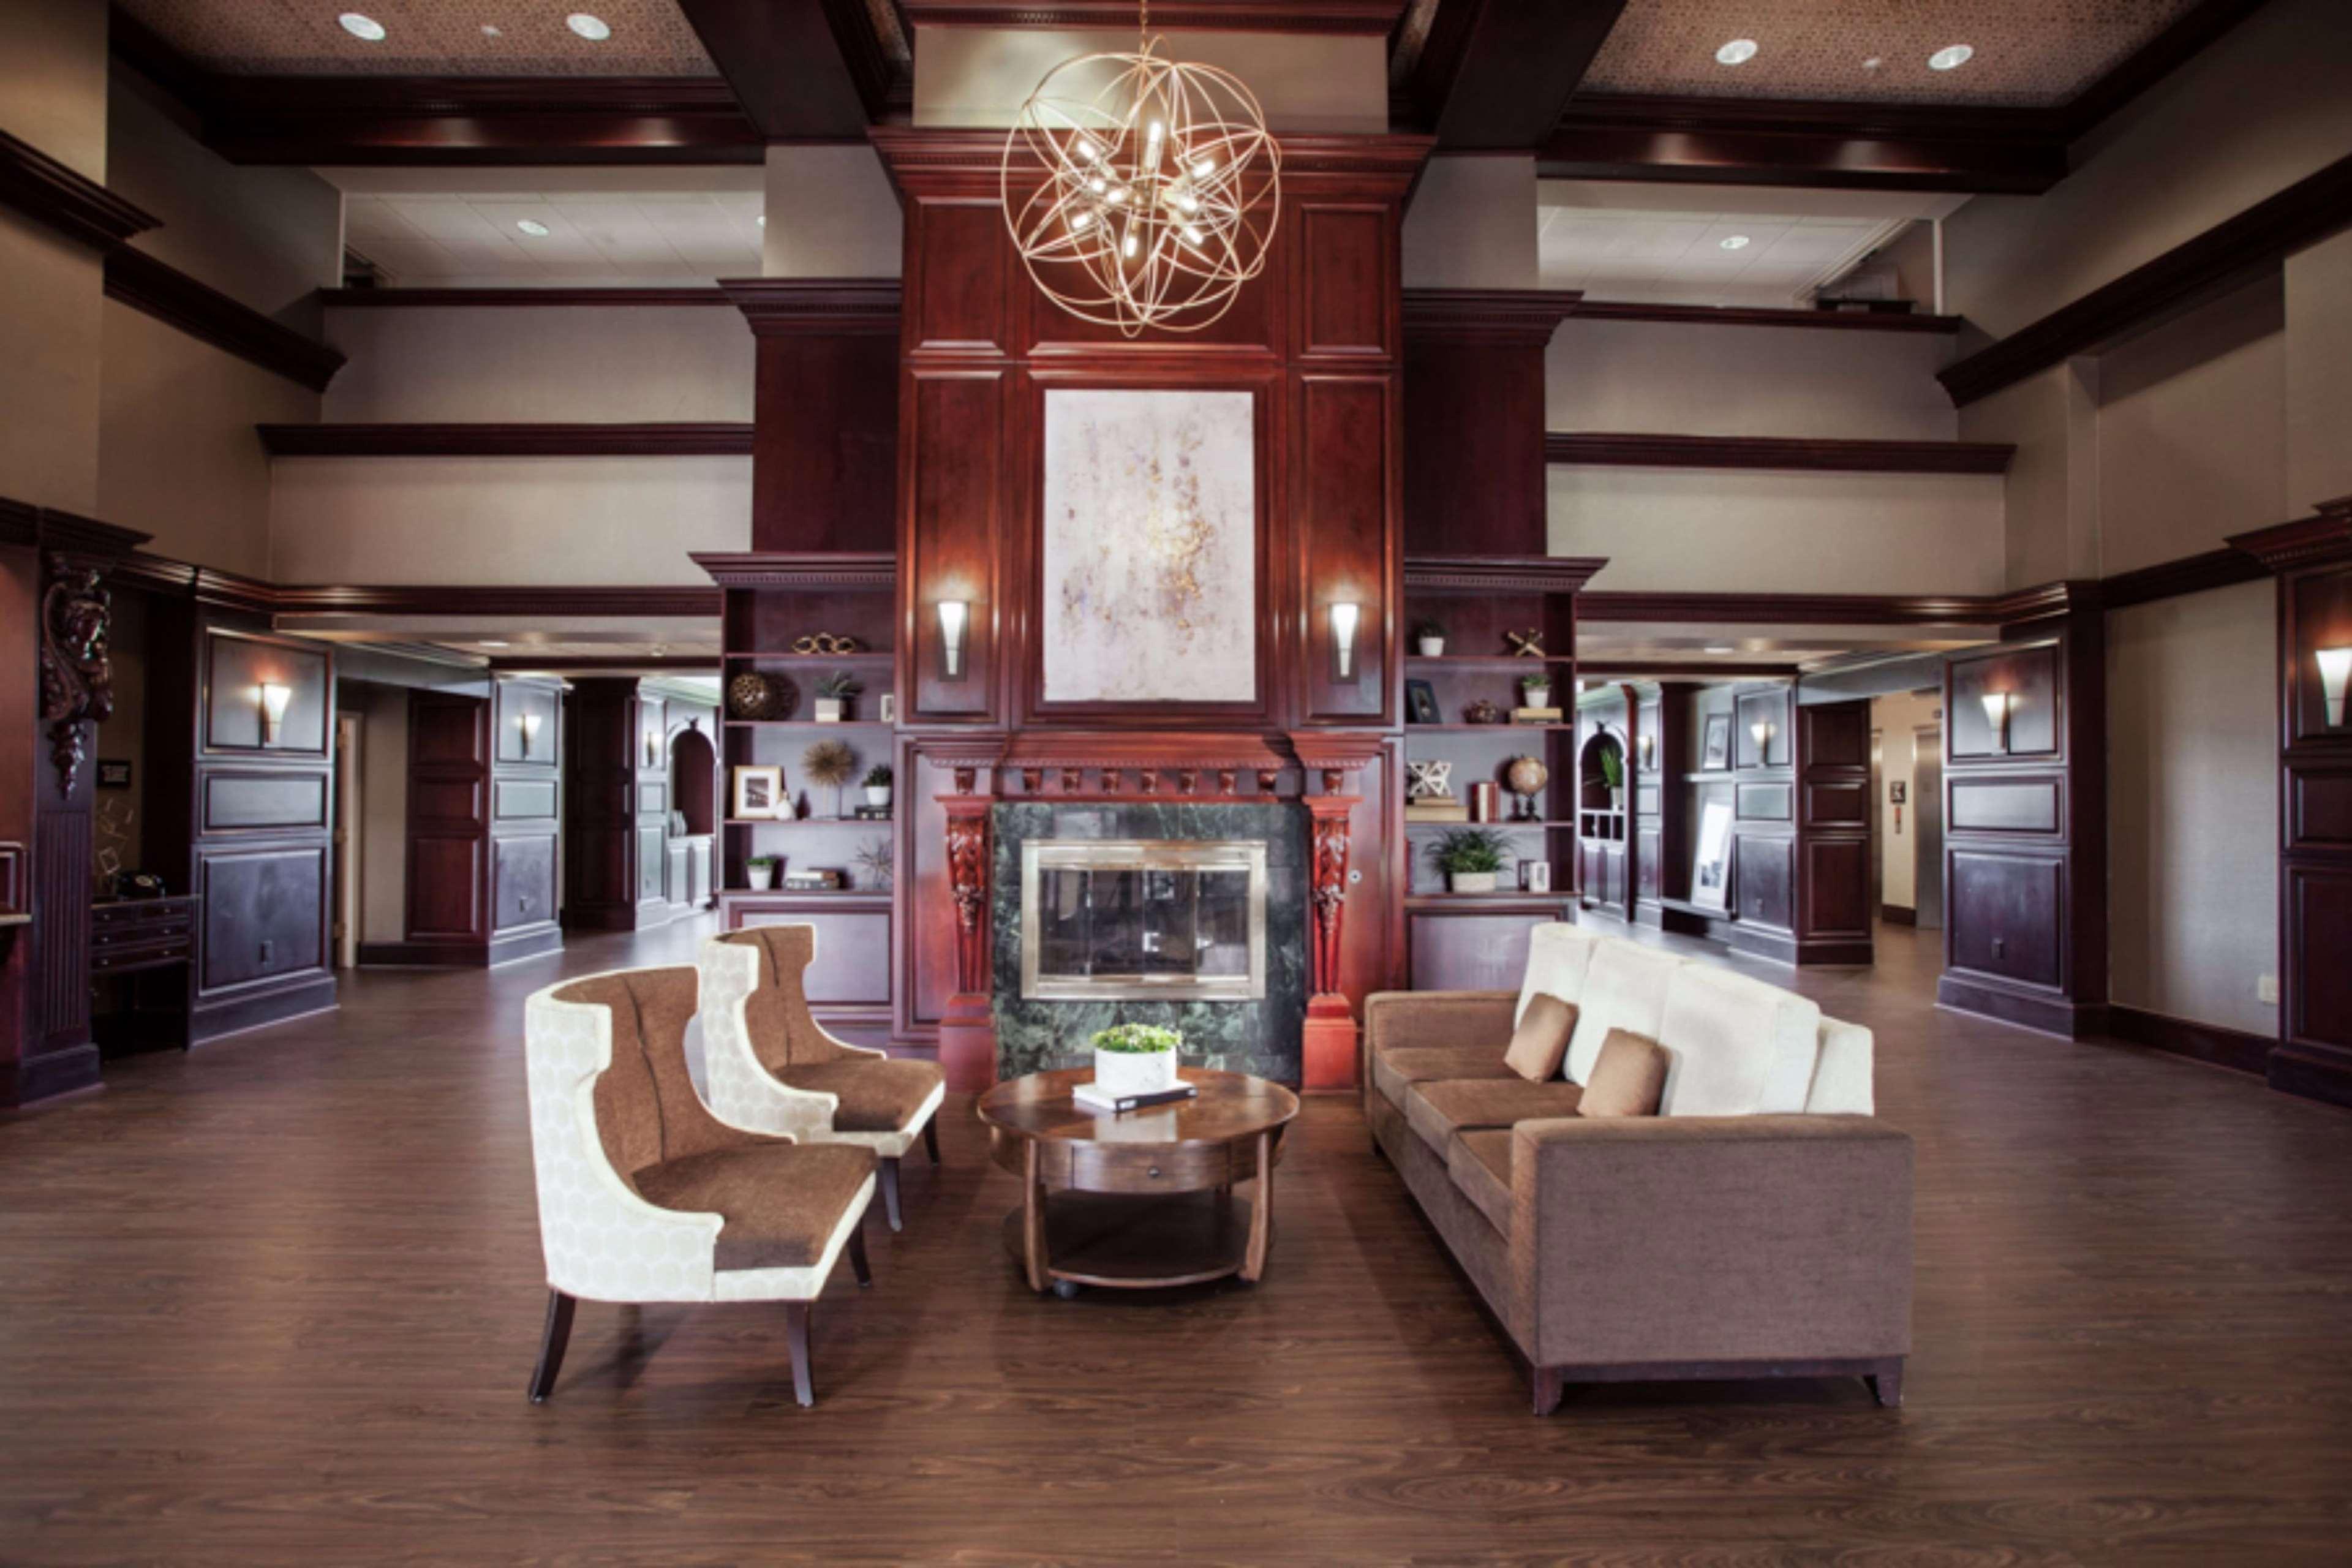 Hampton Inn & Suites Dallas-DFW Airport North-Grapevine image 4